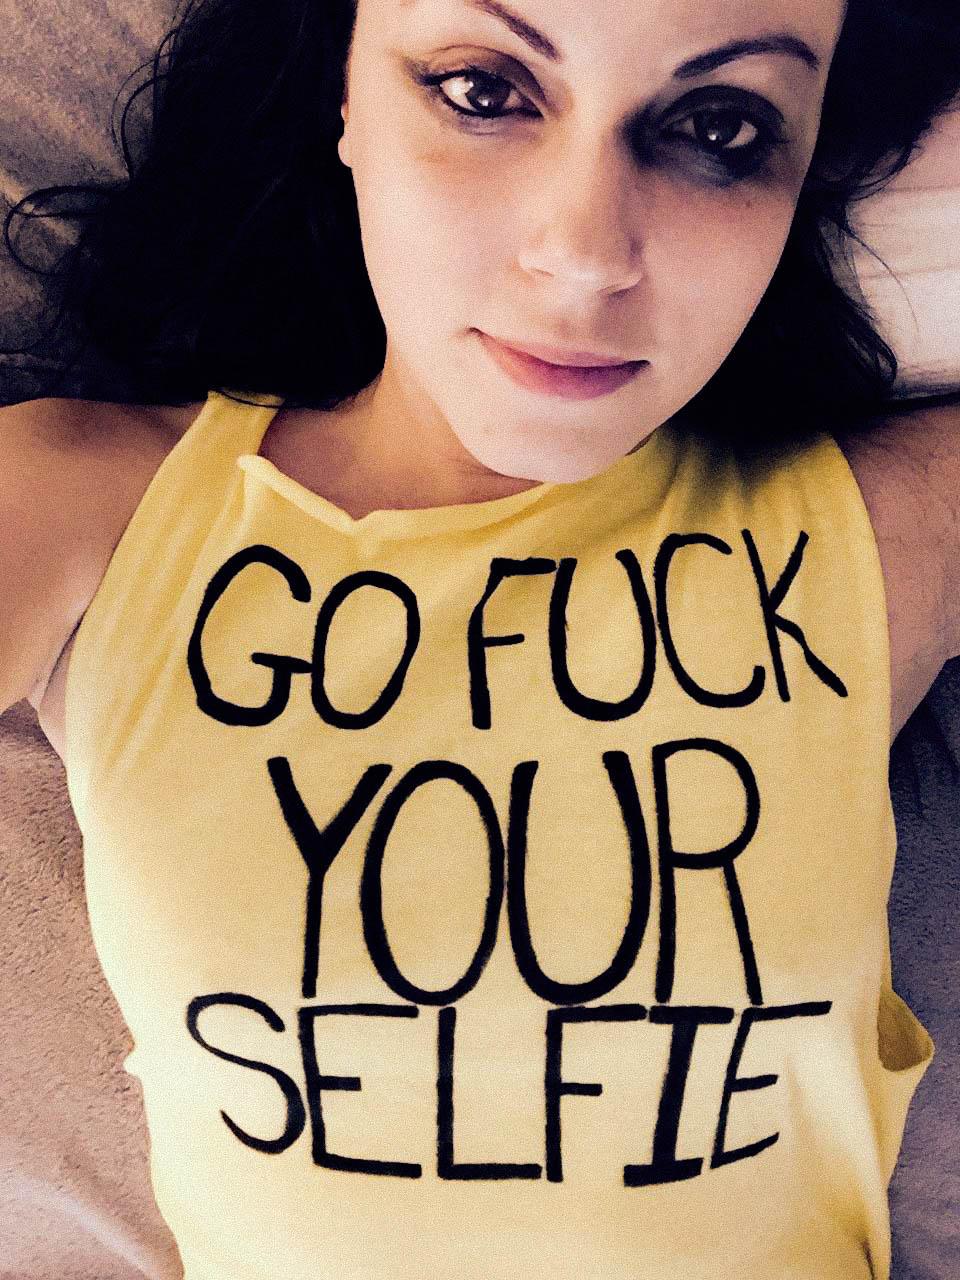 Delila selfie_.jpg